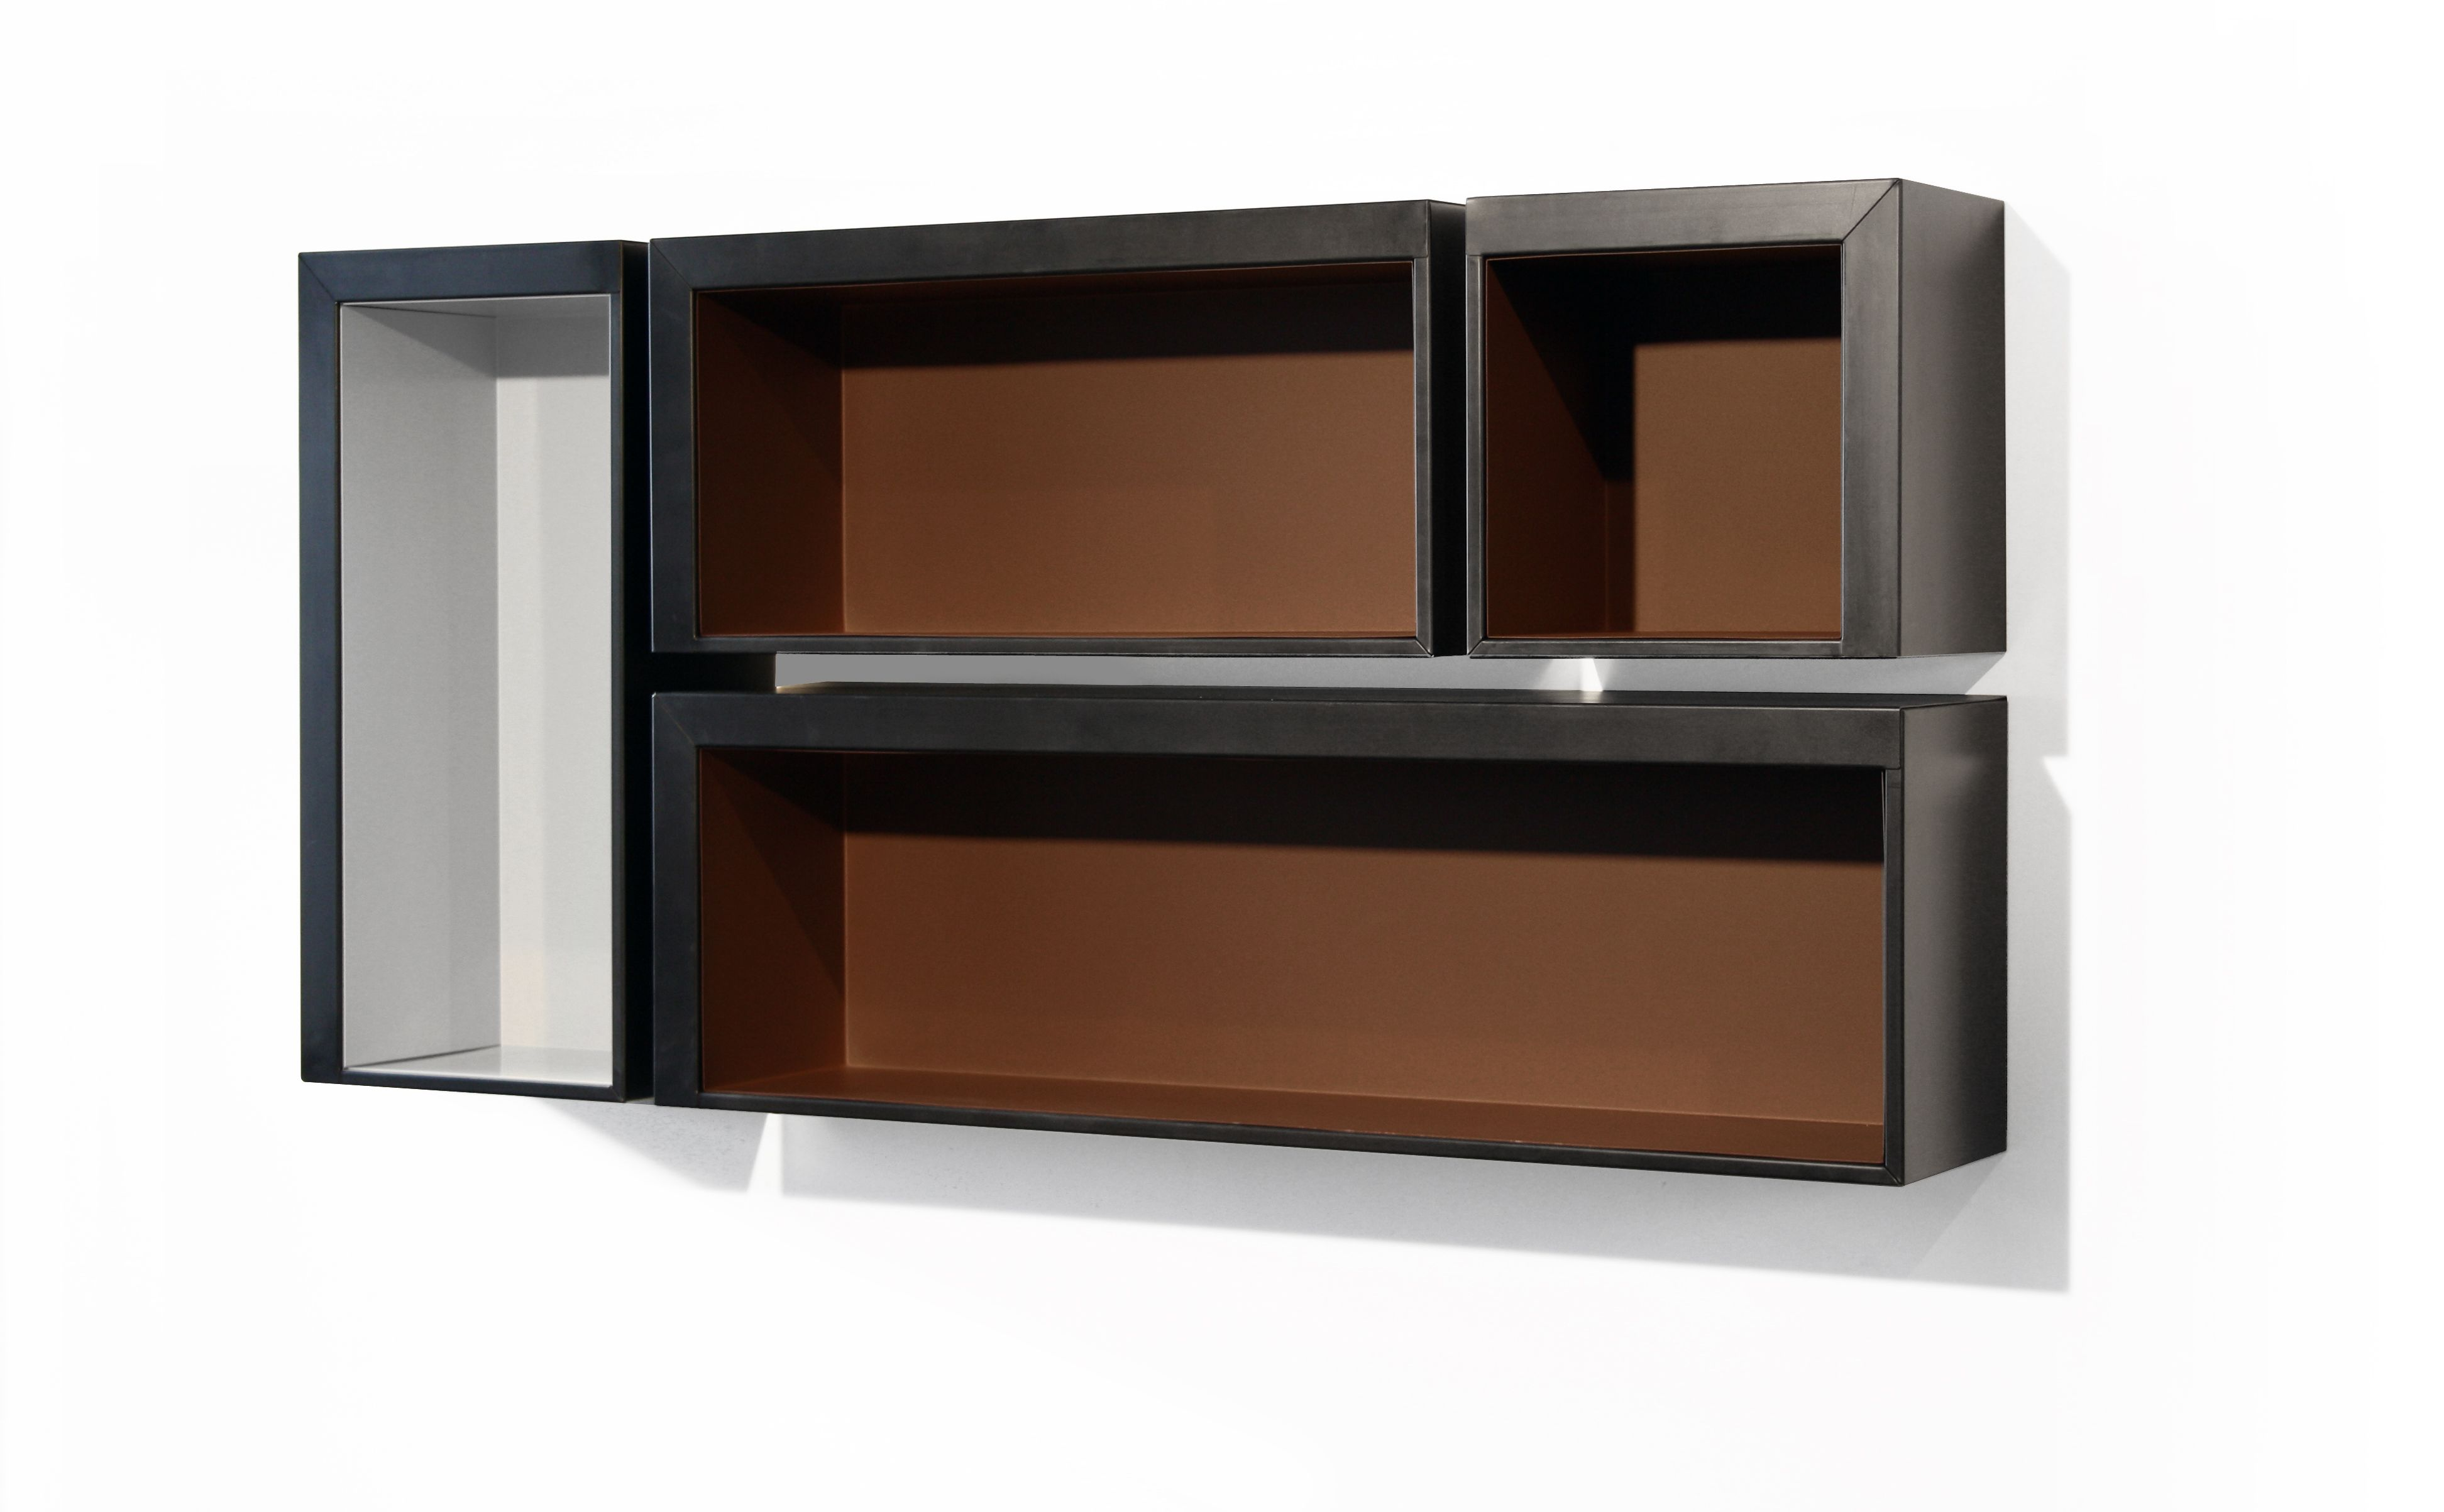 nina shelf 146 x 46 cm 146 x 30 cm black rust by zeus. Black Bedroom Furniture Sets. Home Design Ideas